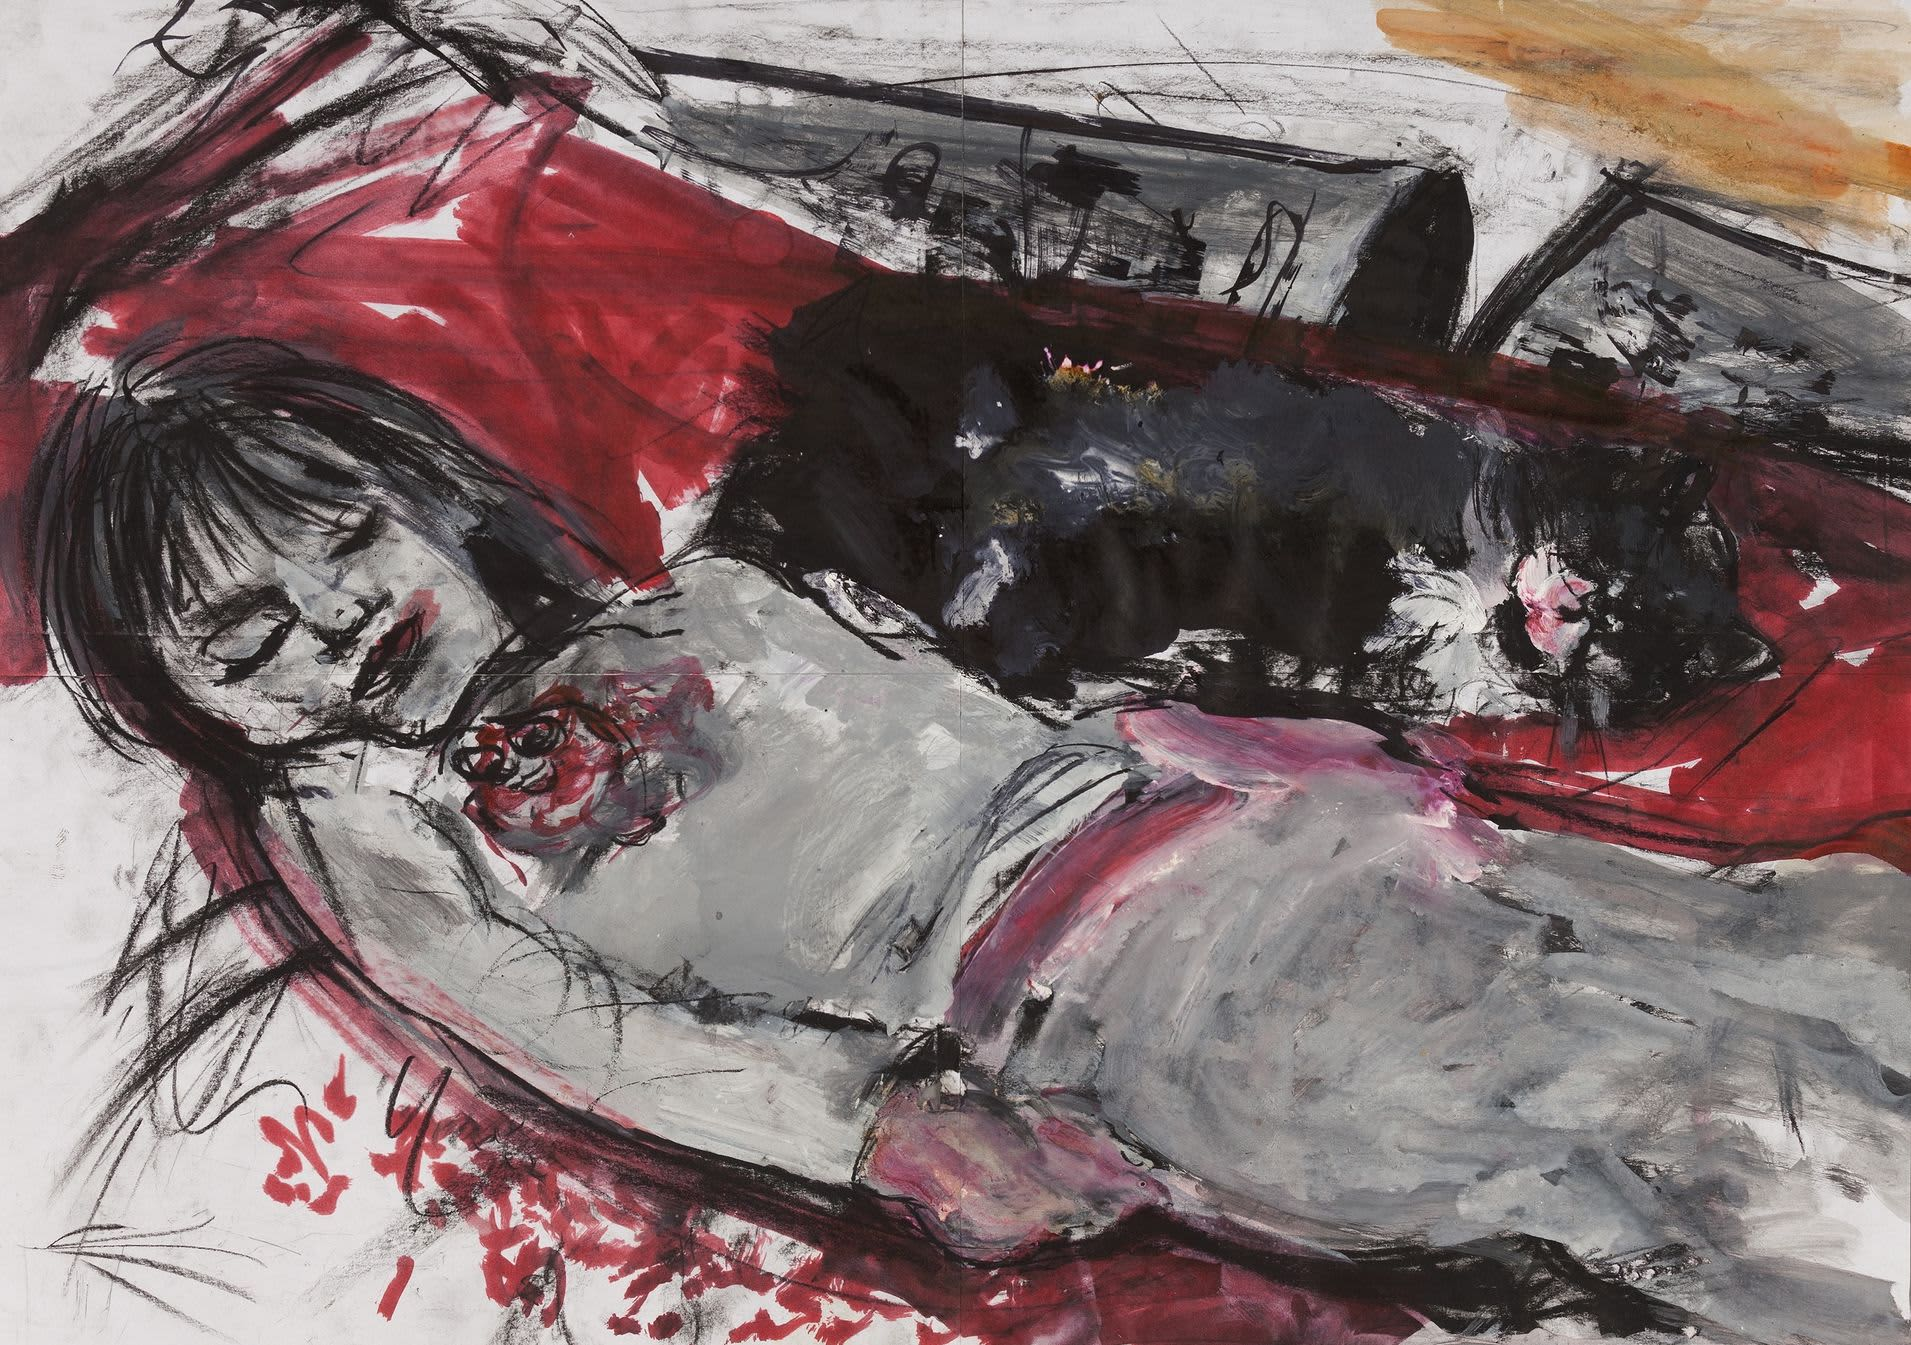 Erik van Lieshout, Untitled (the Basement)